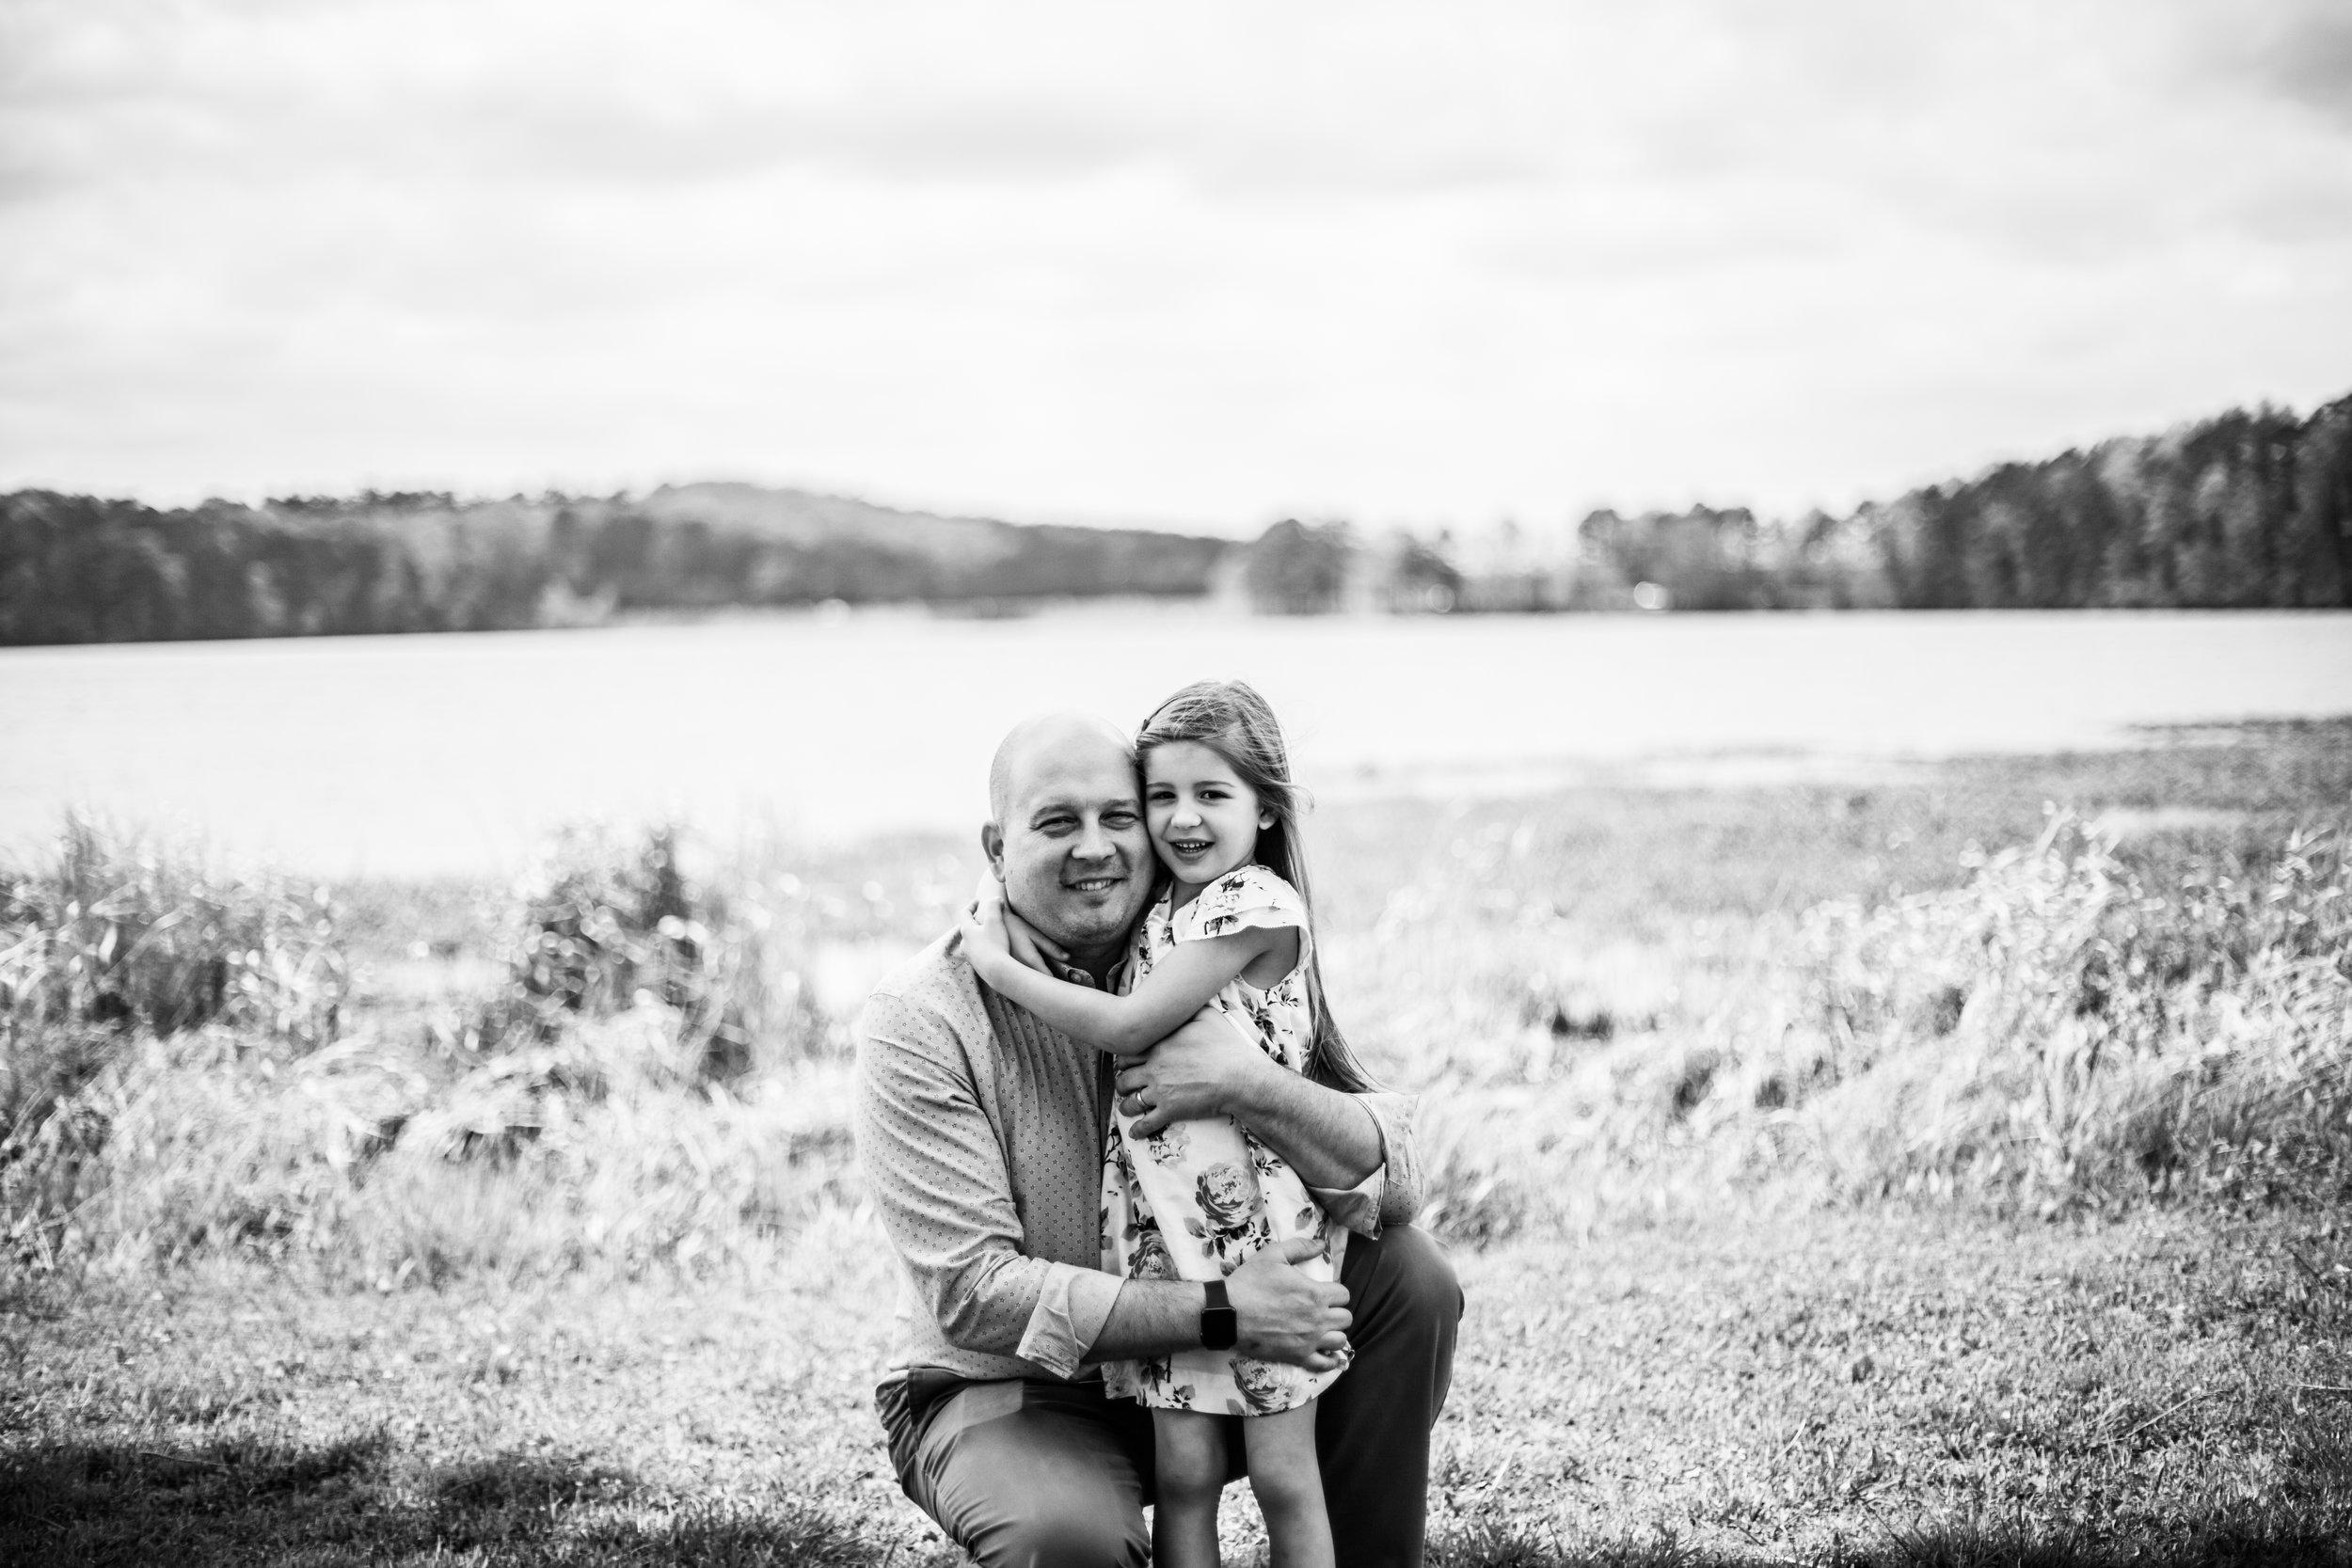 woodstock-family-photography-mini-session-acworth-beach-23.jpg